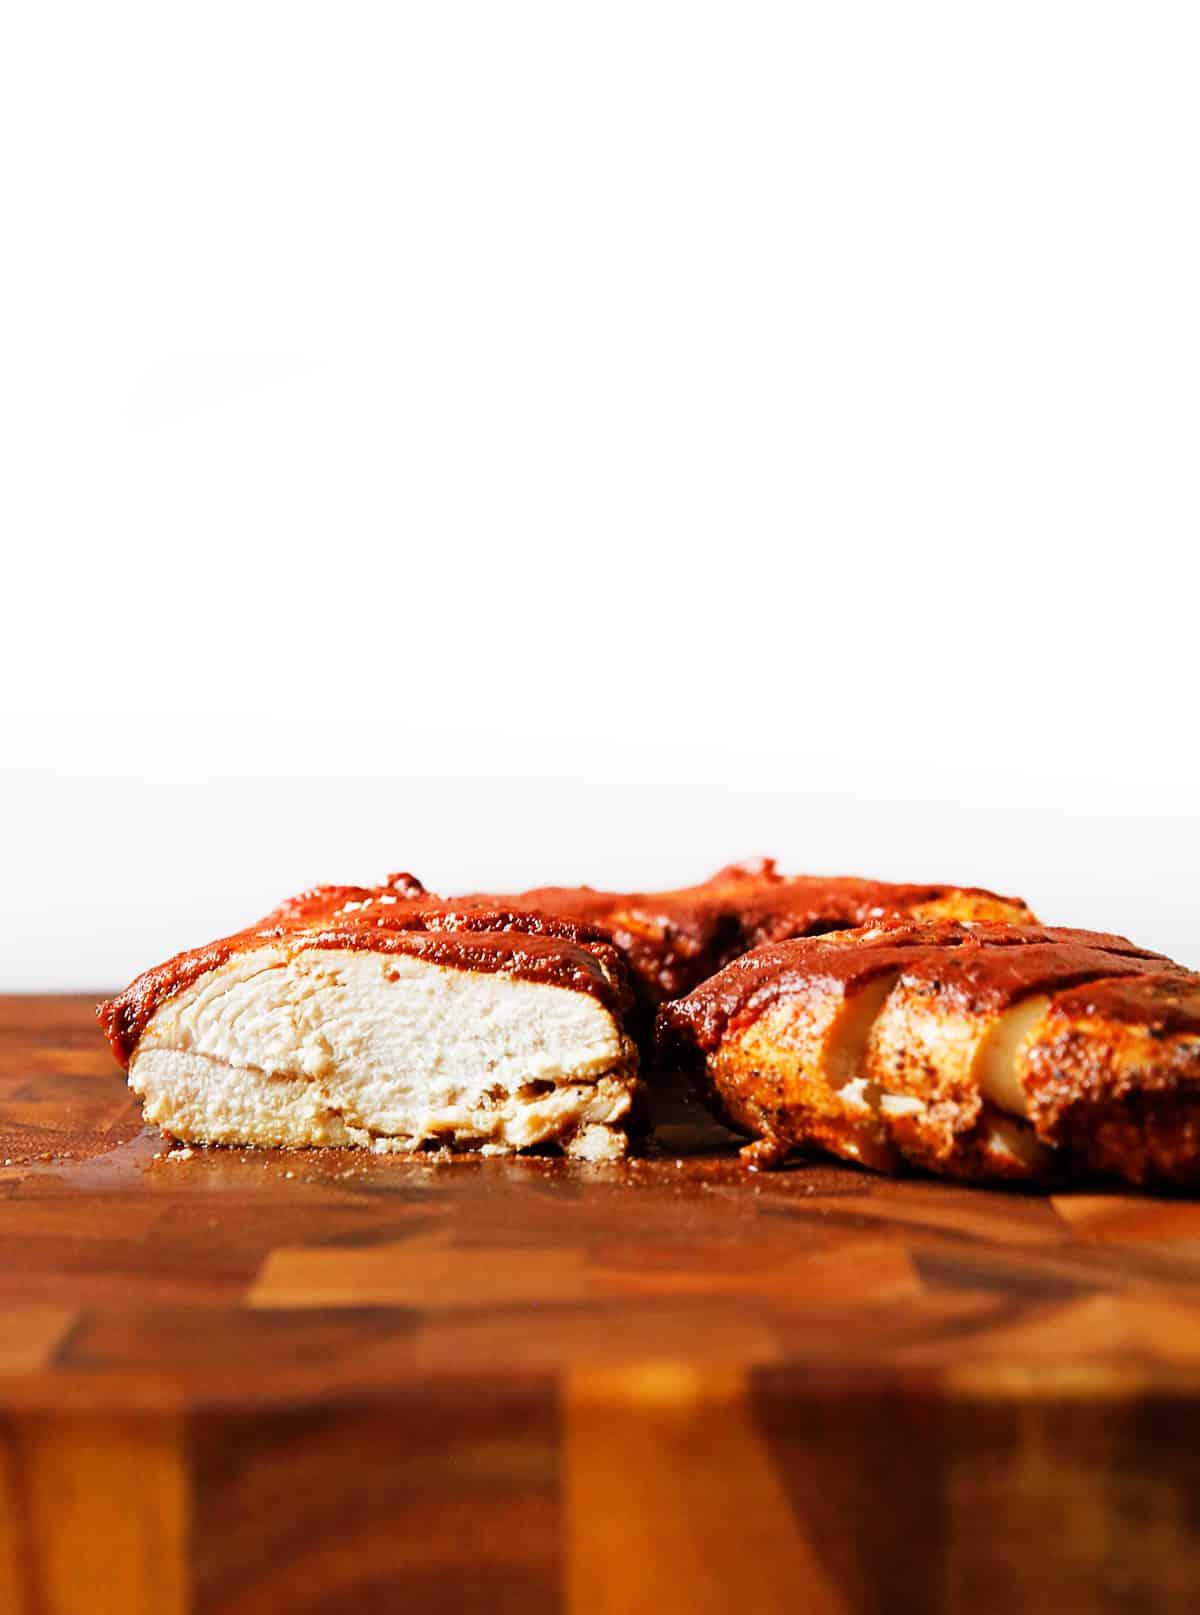 Juicy sliced baked bbq chicken breast